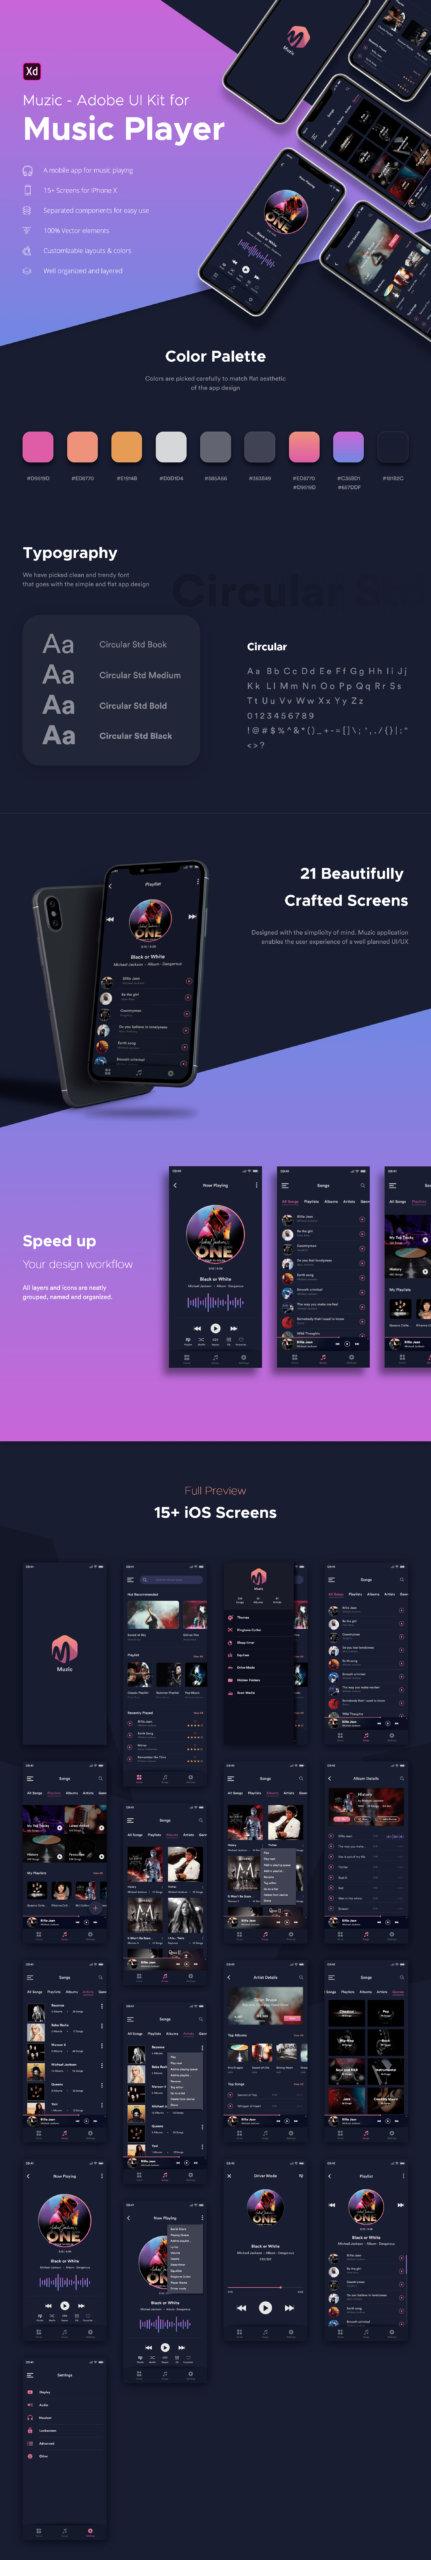 Muzic - Free Mobile UI Kit for Adobe XD from UIGarage